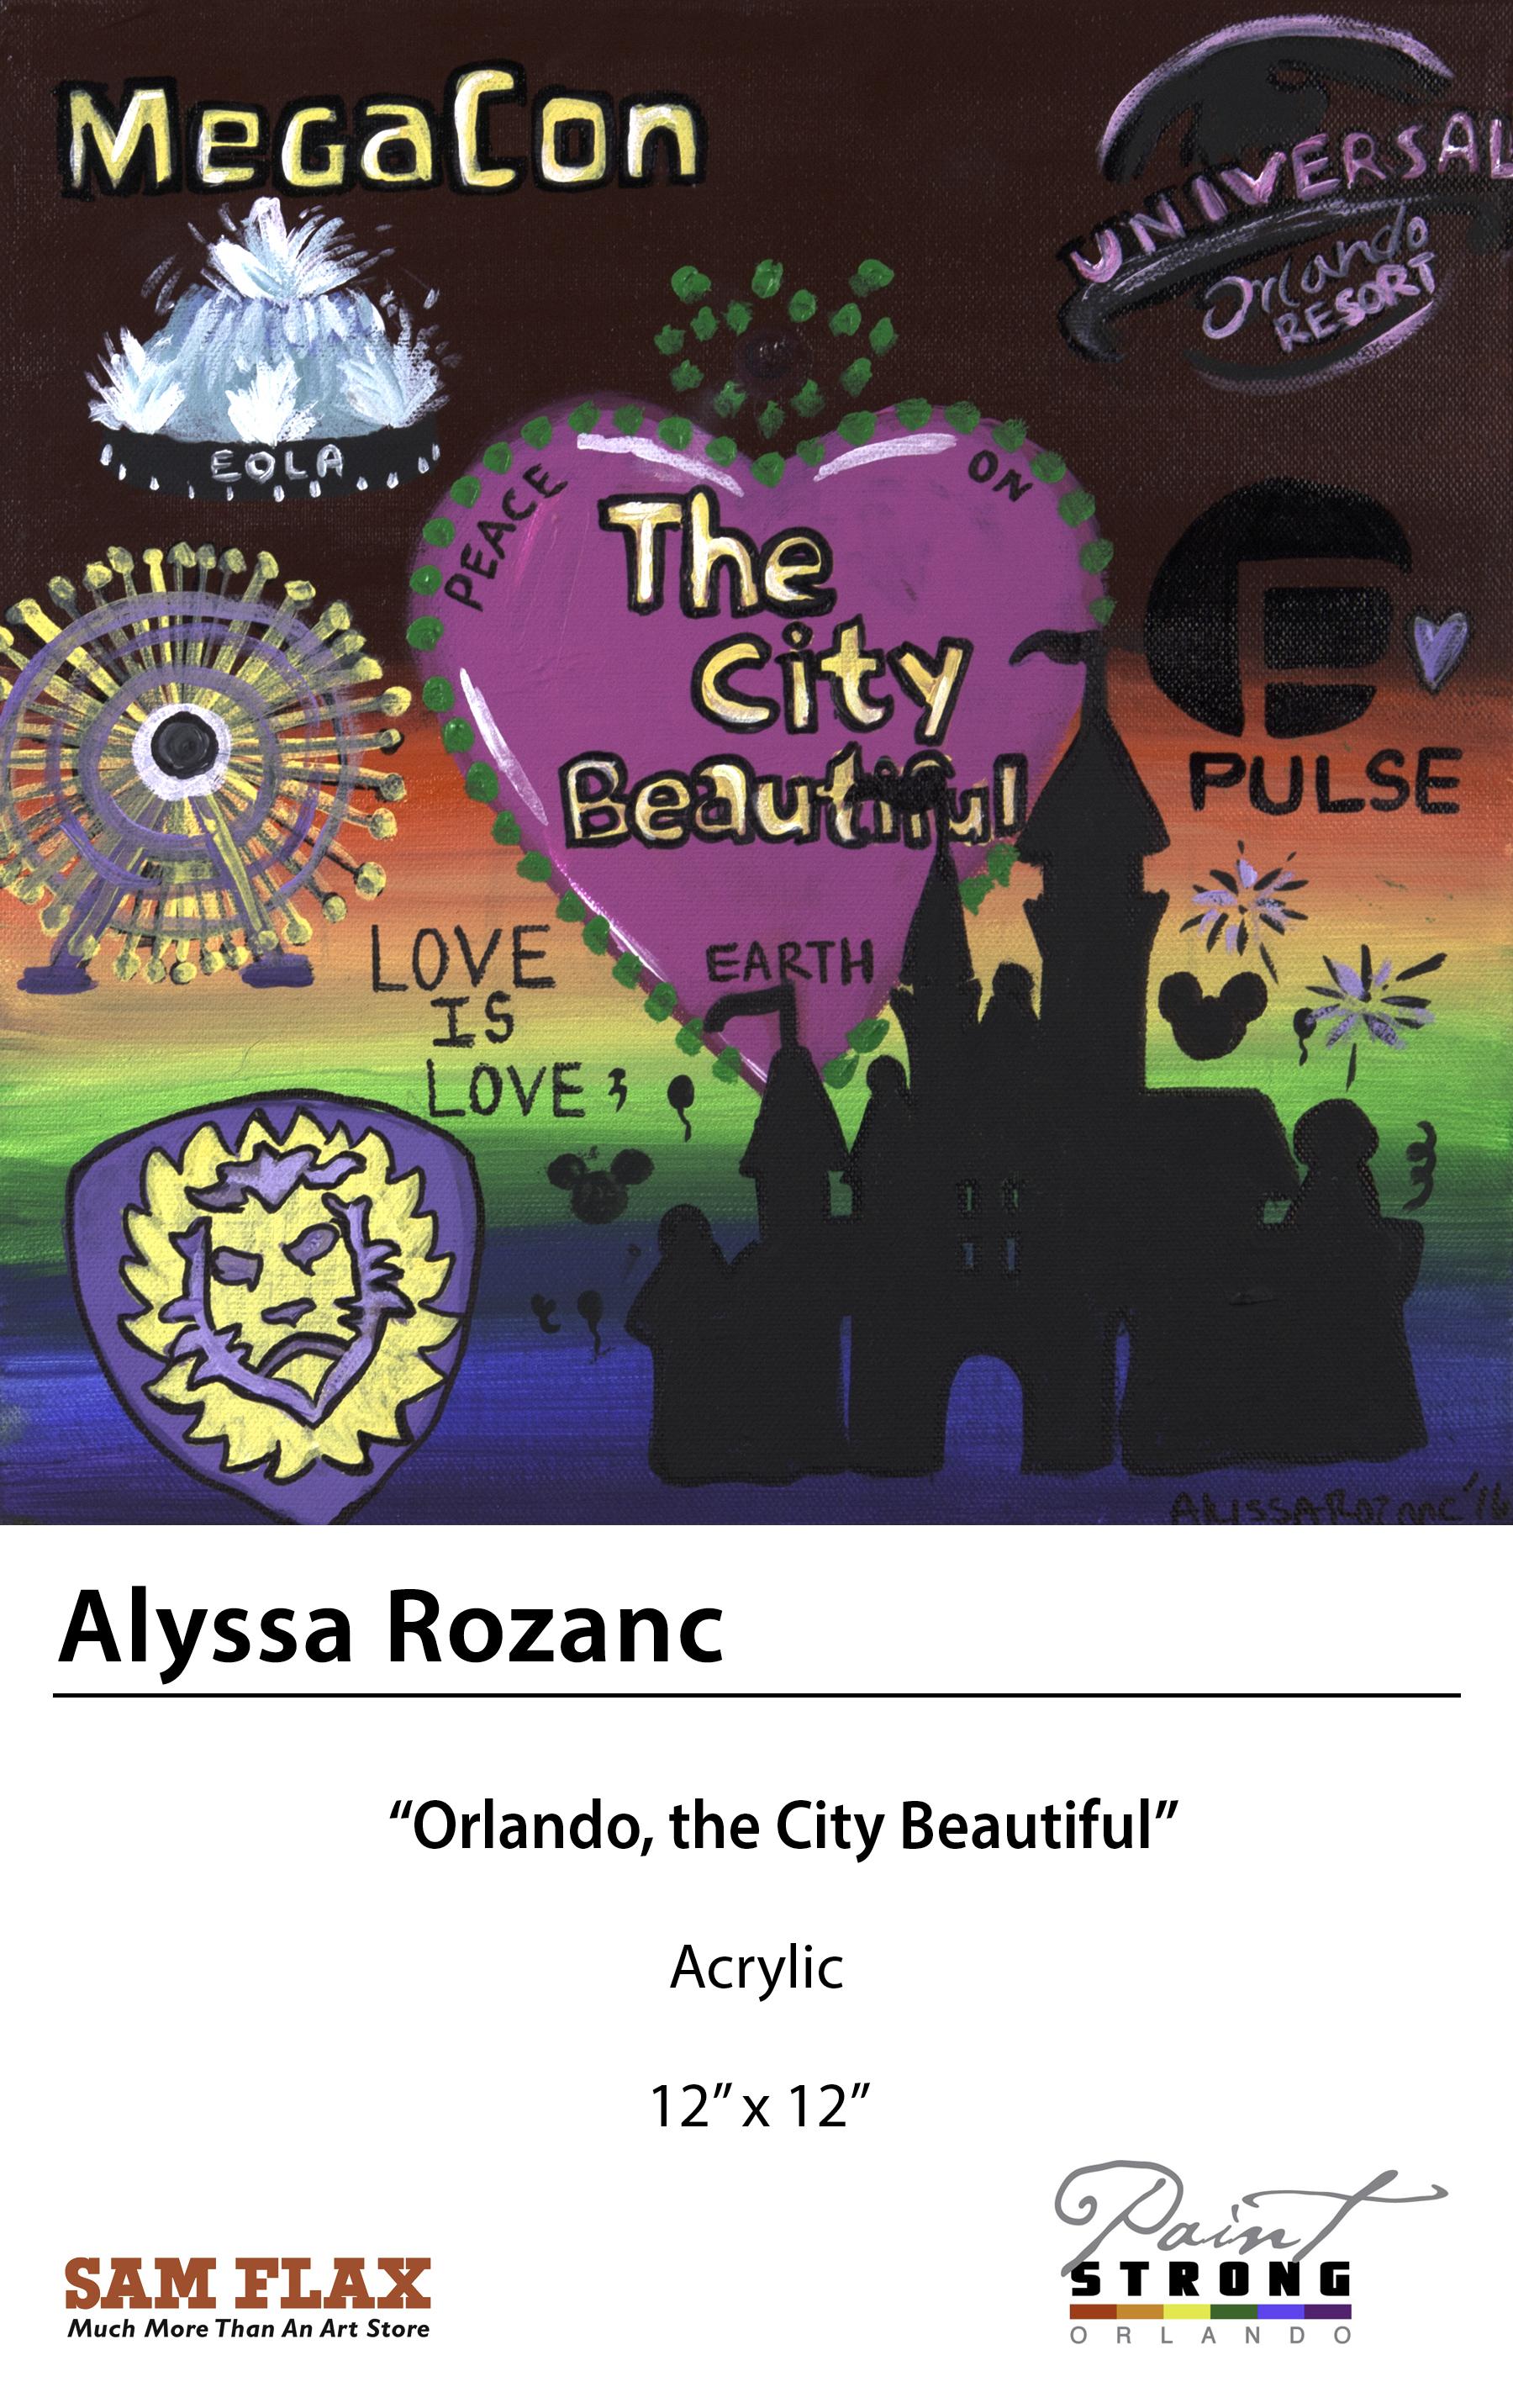 Alyssa Rozanc